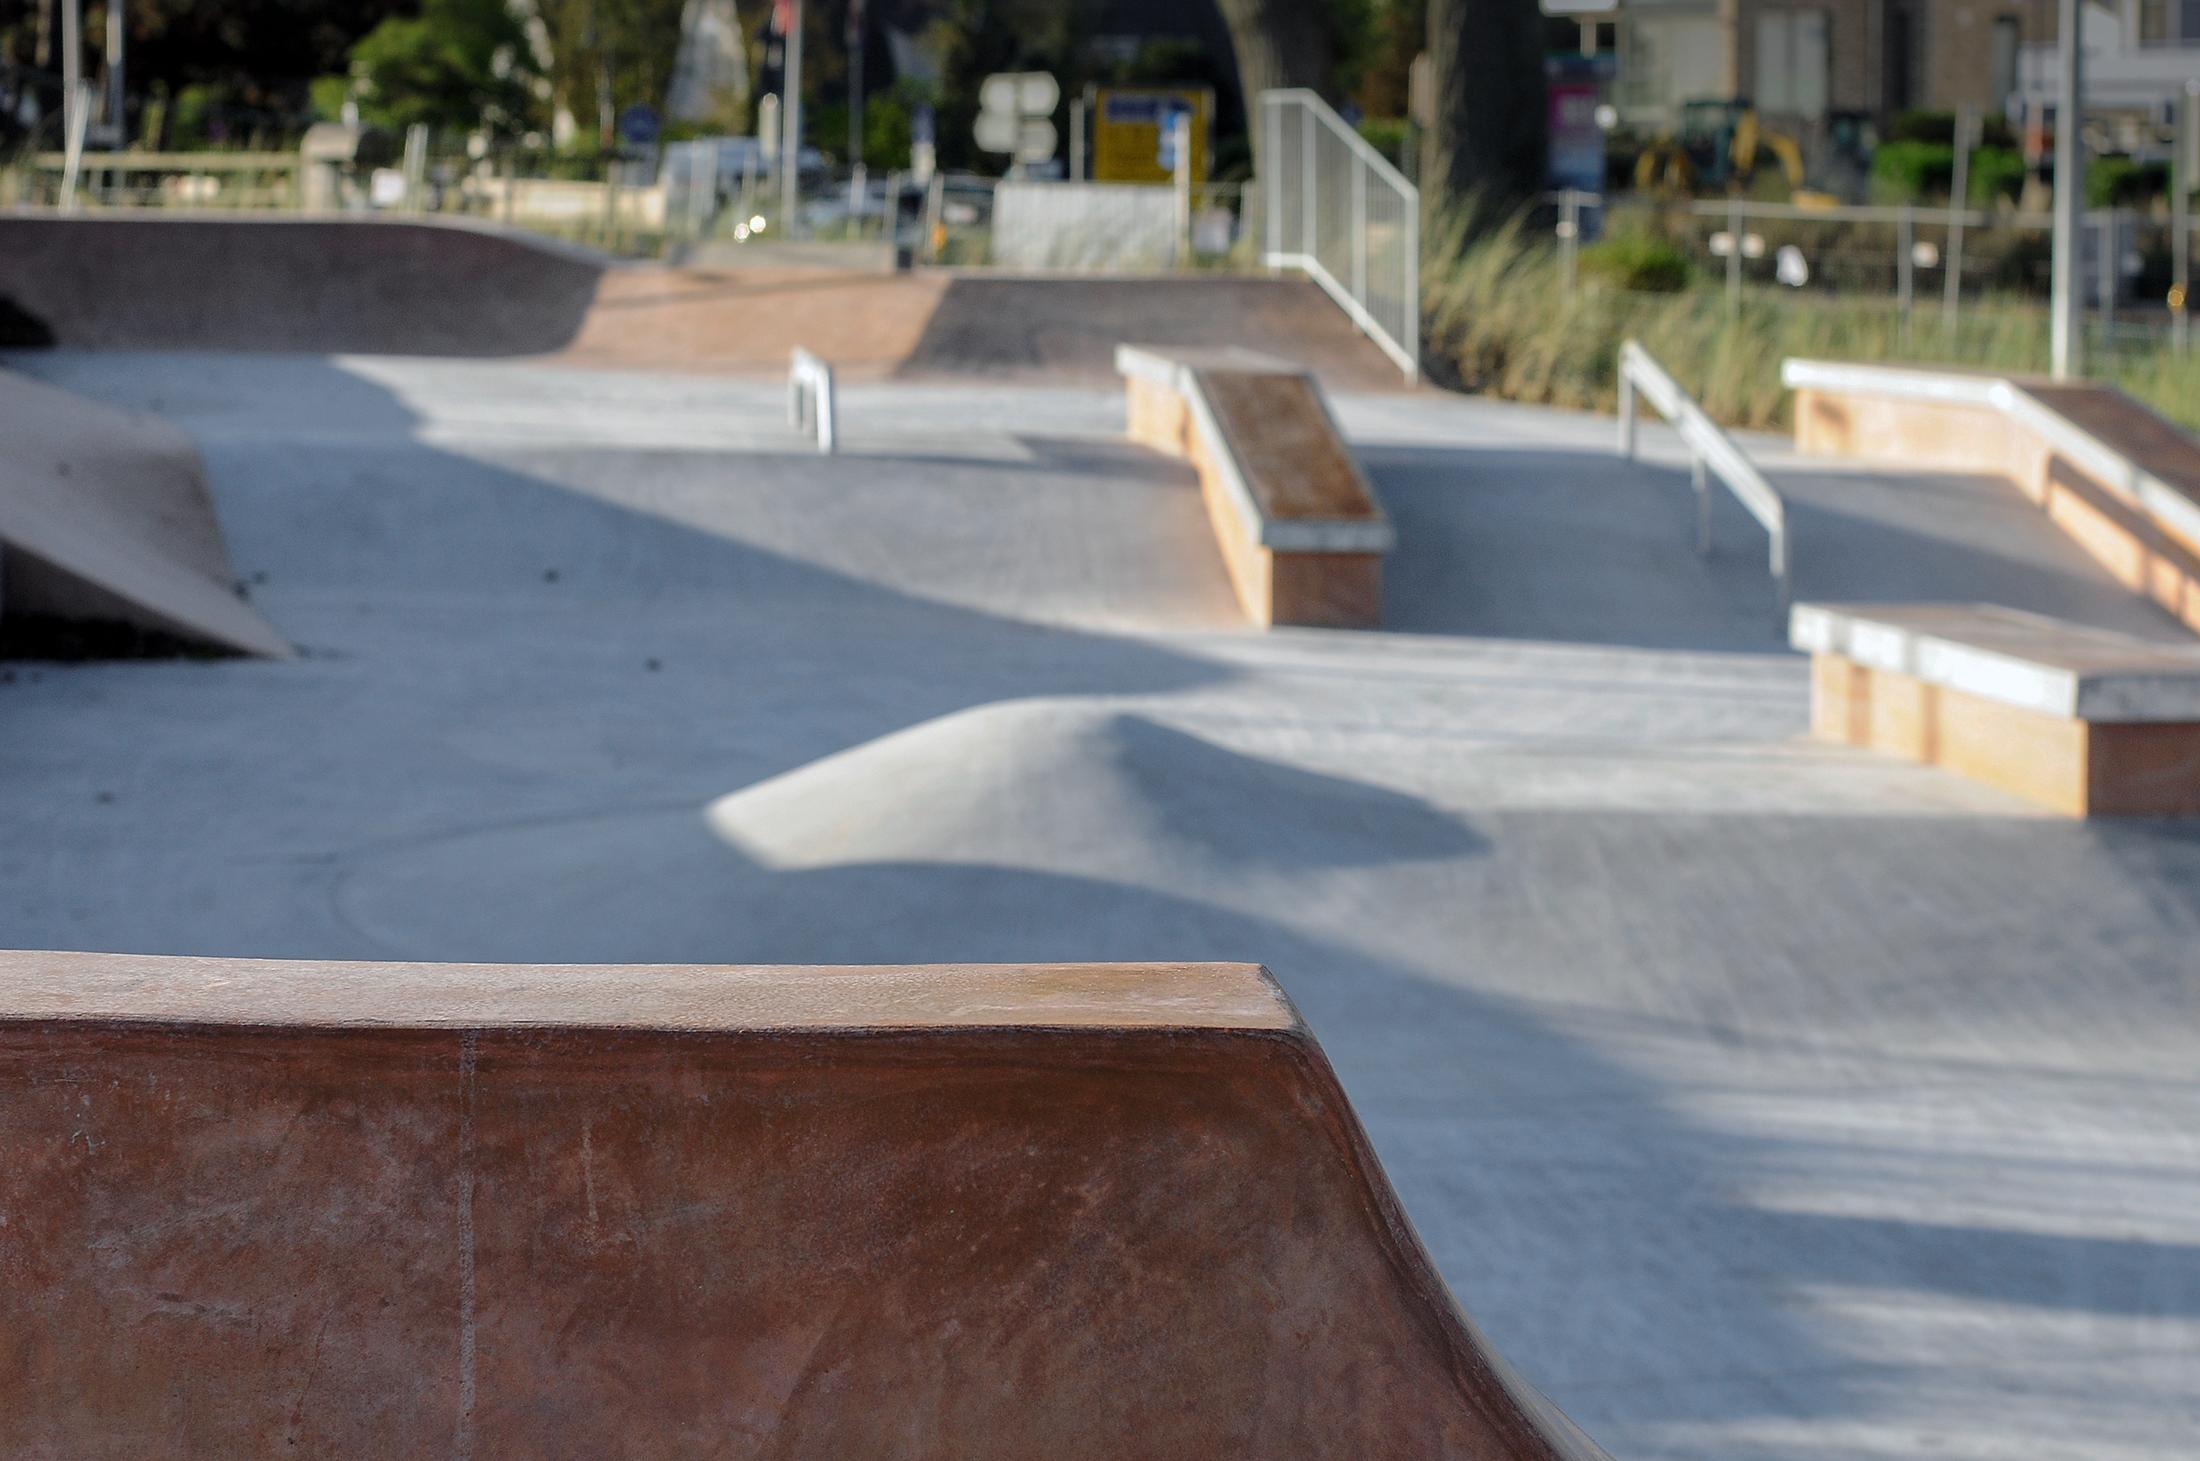 ML_Skatepark_Scharbeutz_02